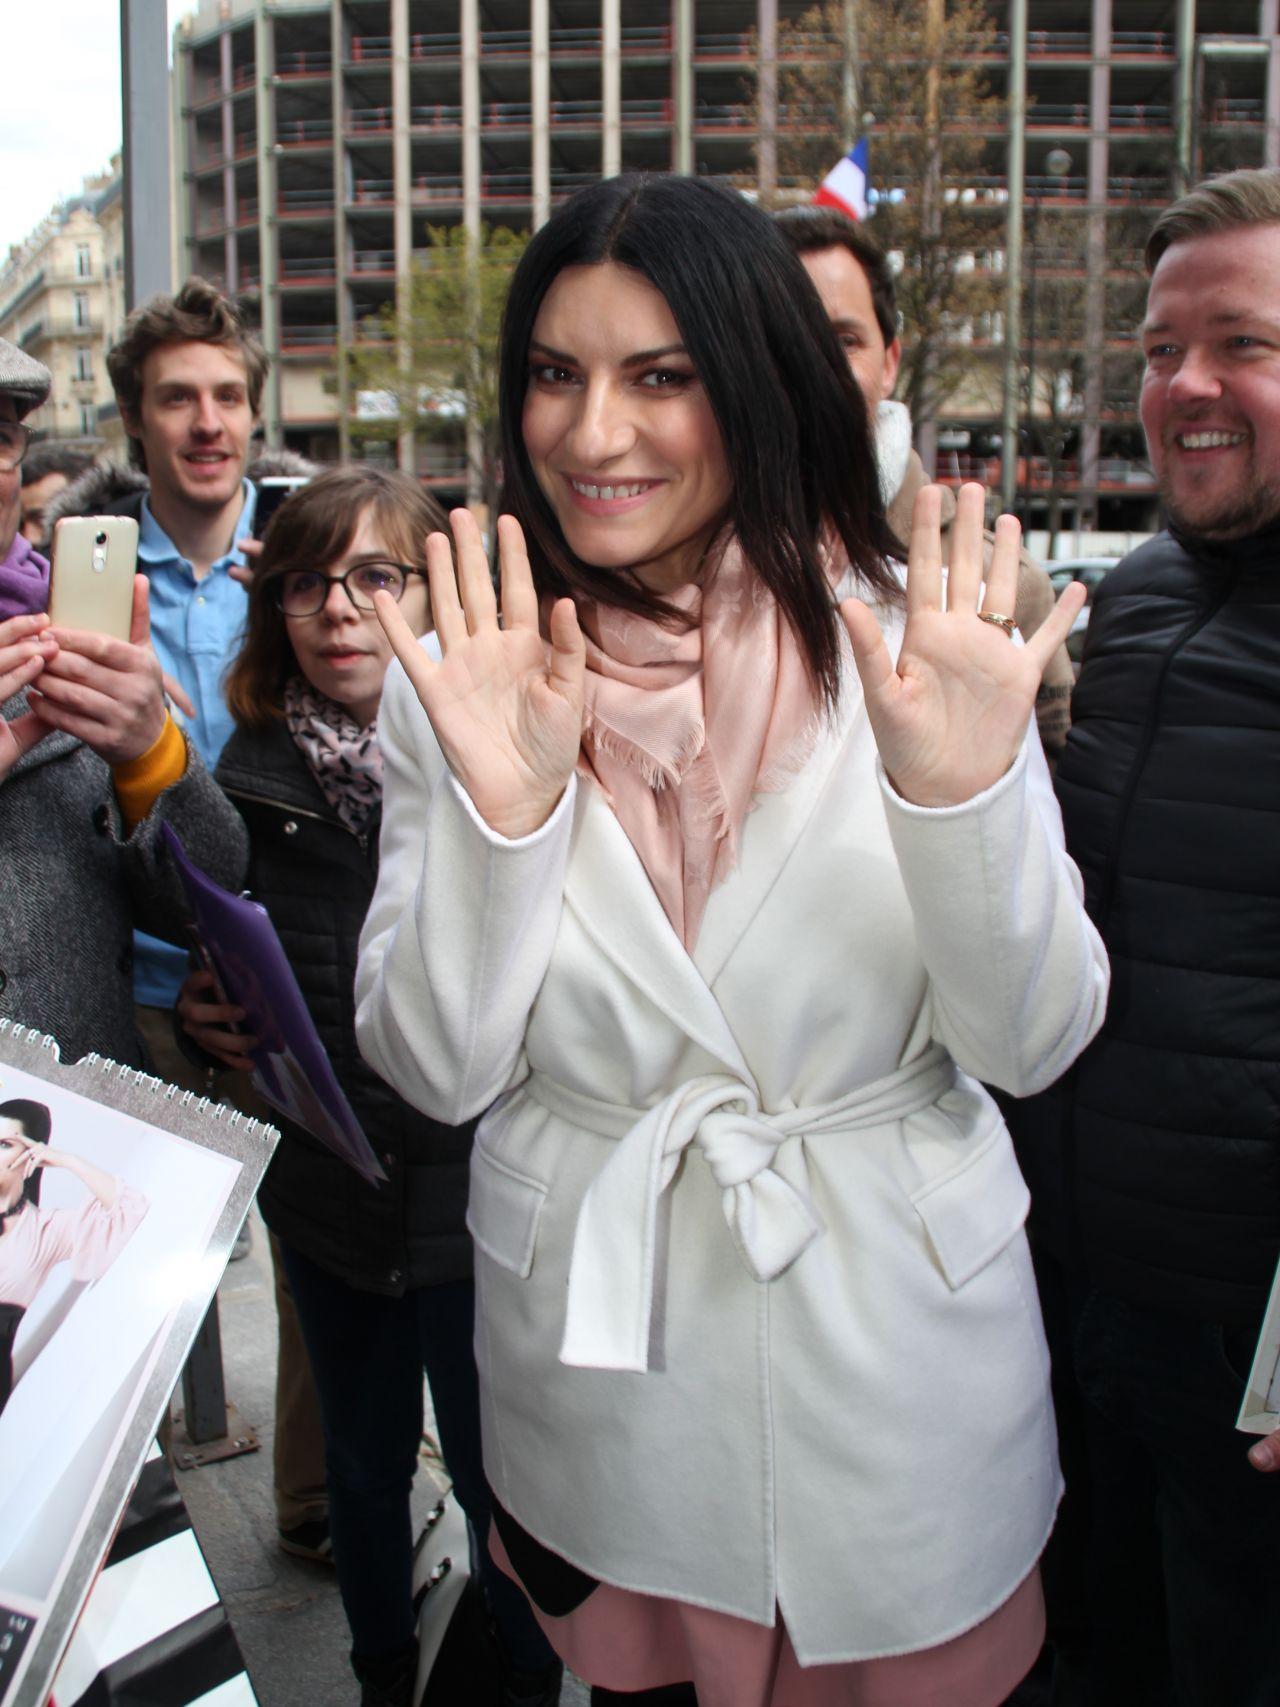 http://celebmafia.com/wp-content/uploads/2018/03/laura-pausini-leaves-a-hotel-in-paris-03-29-2018-2.jpg